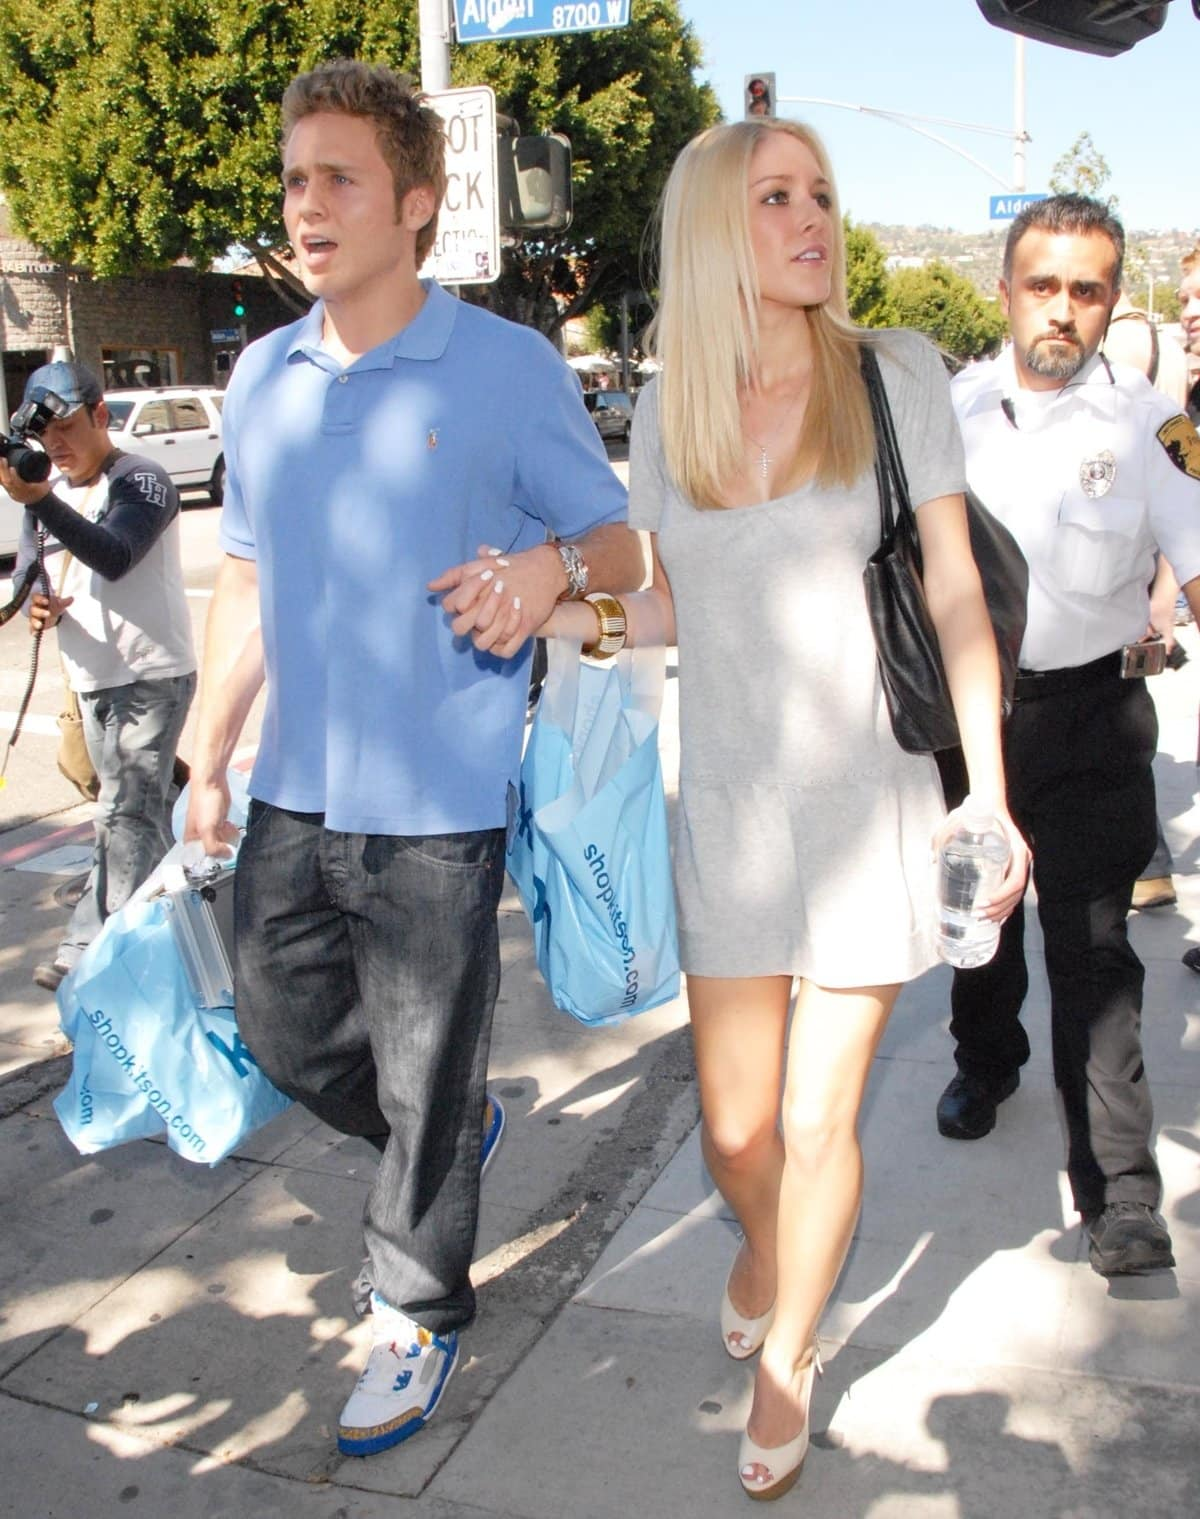 Heidi Montag met her boyfriend Spencer Pratt while filming The Hills in 2006